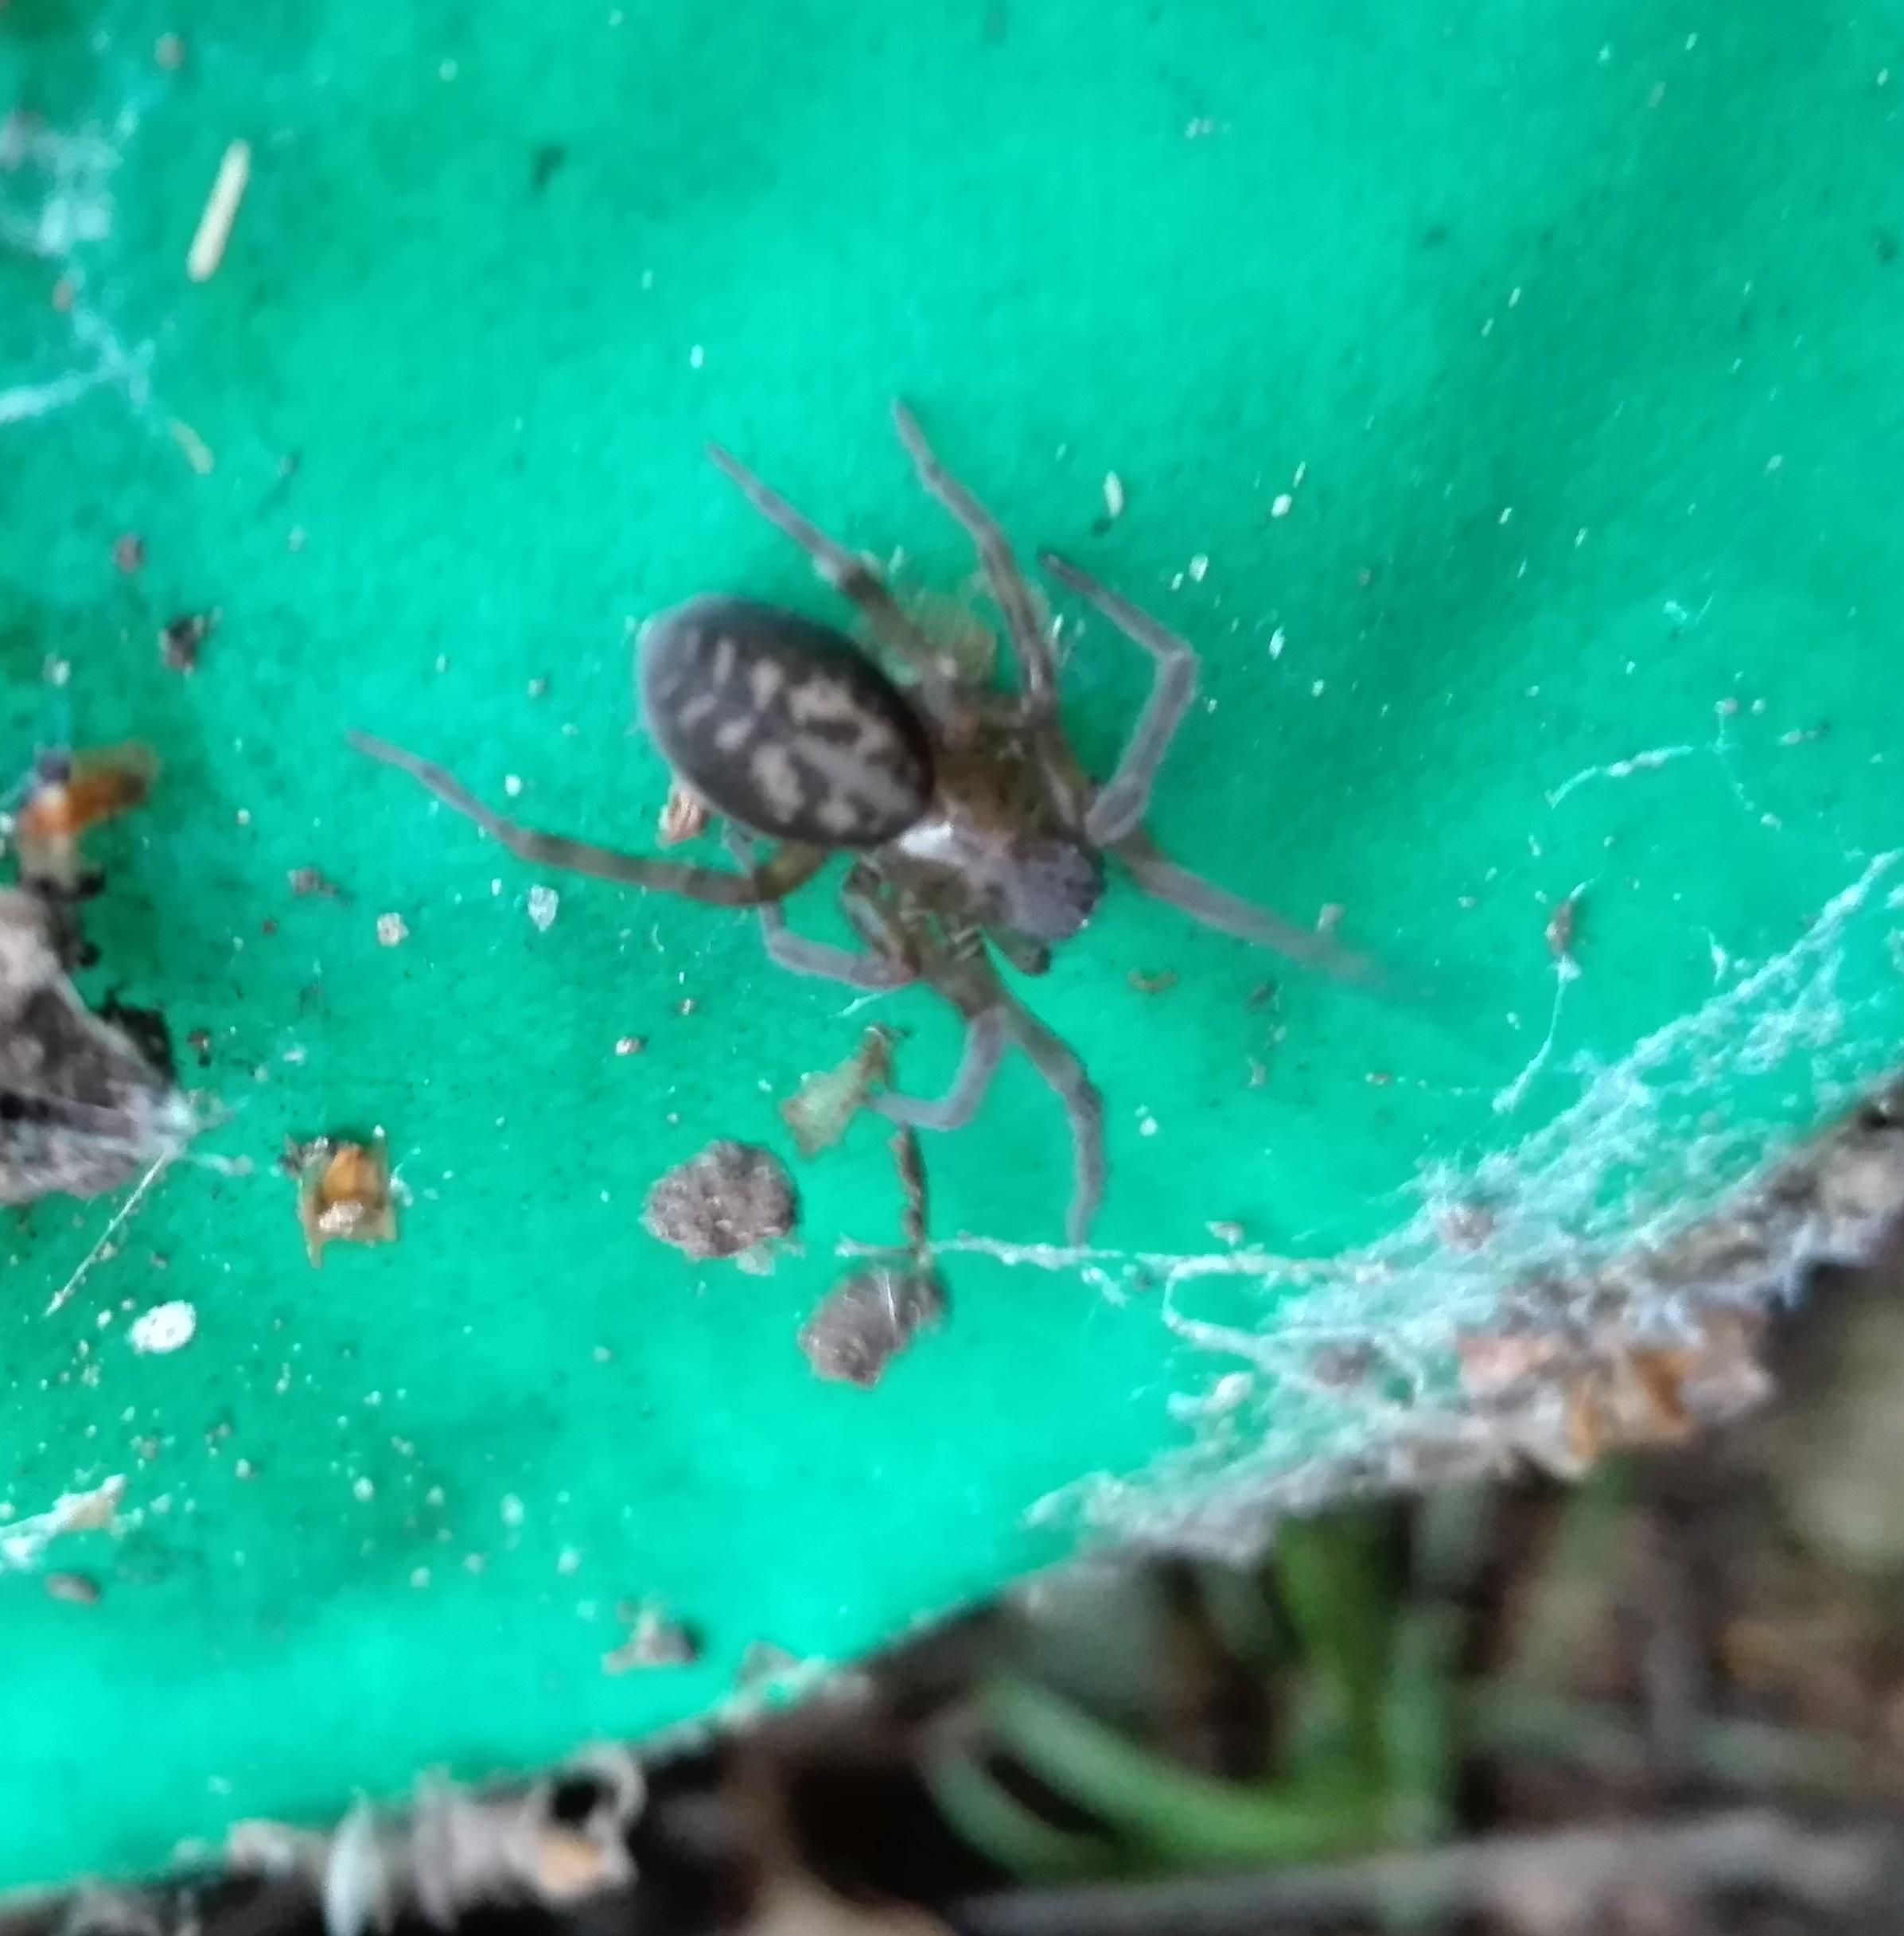 #103 Black Lace Weaver Spider (Amaurobius ferox)